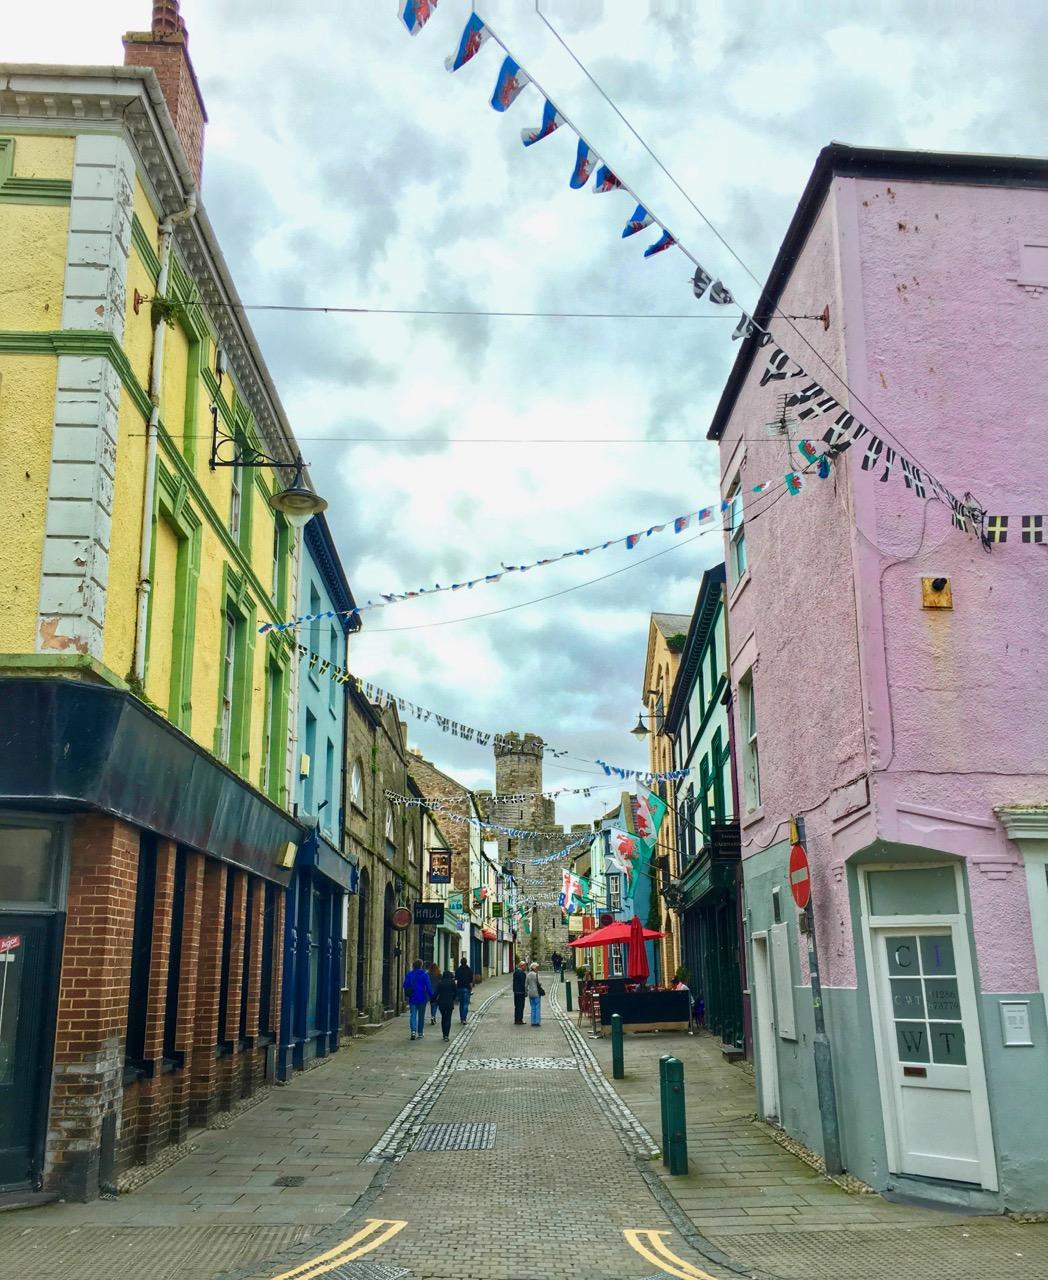 Caernarfon, Wales